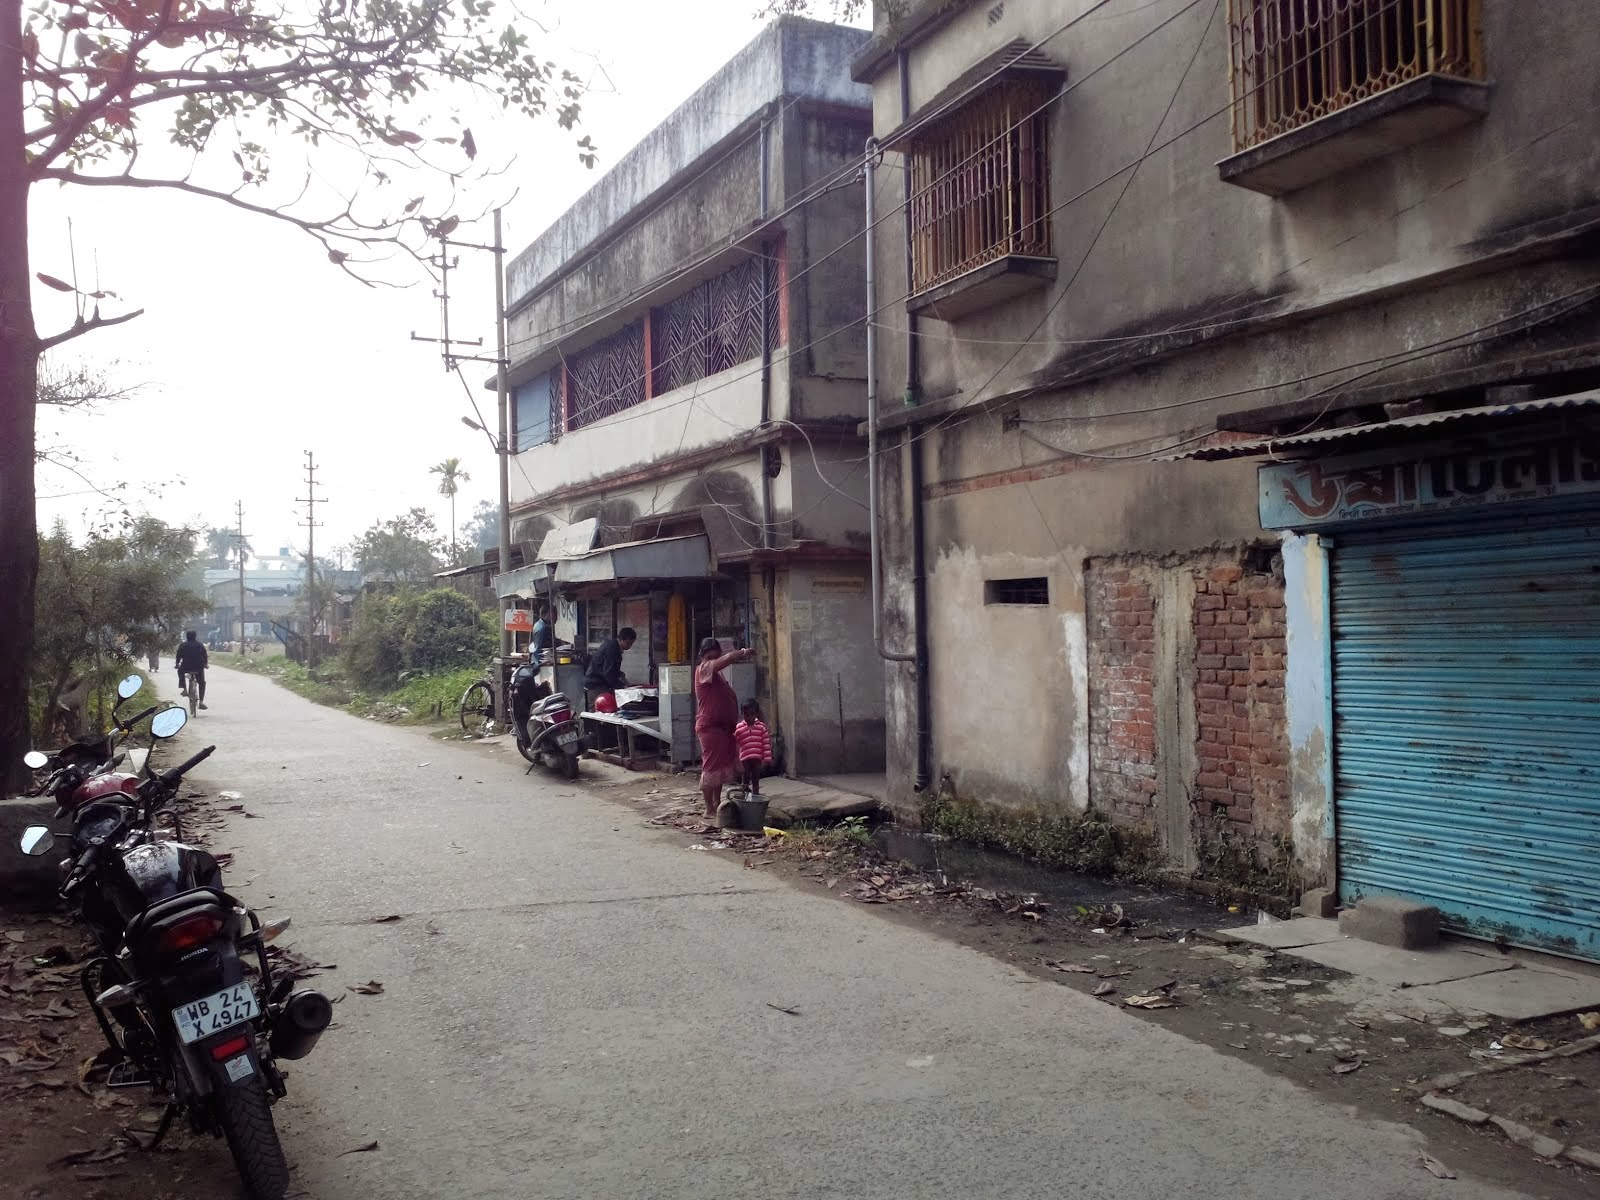 Kishori Mohan Bandyopadhyay Road, Panihati, West Bengal, India.